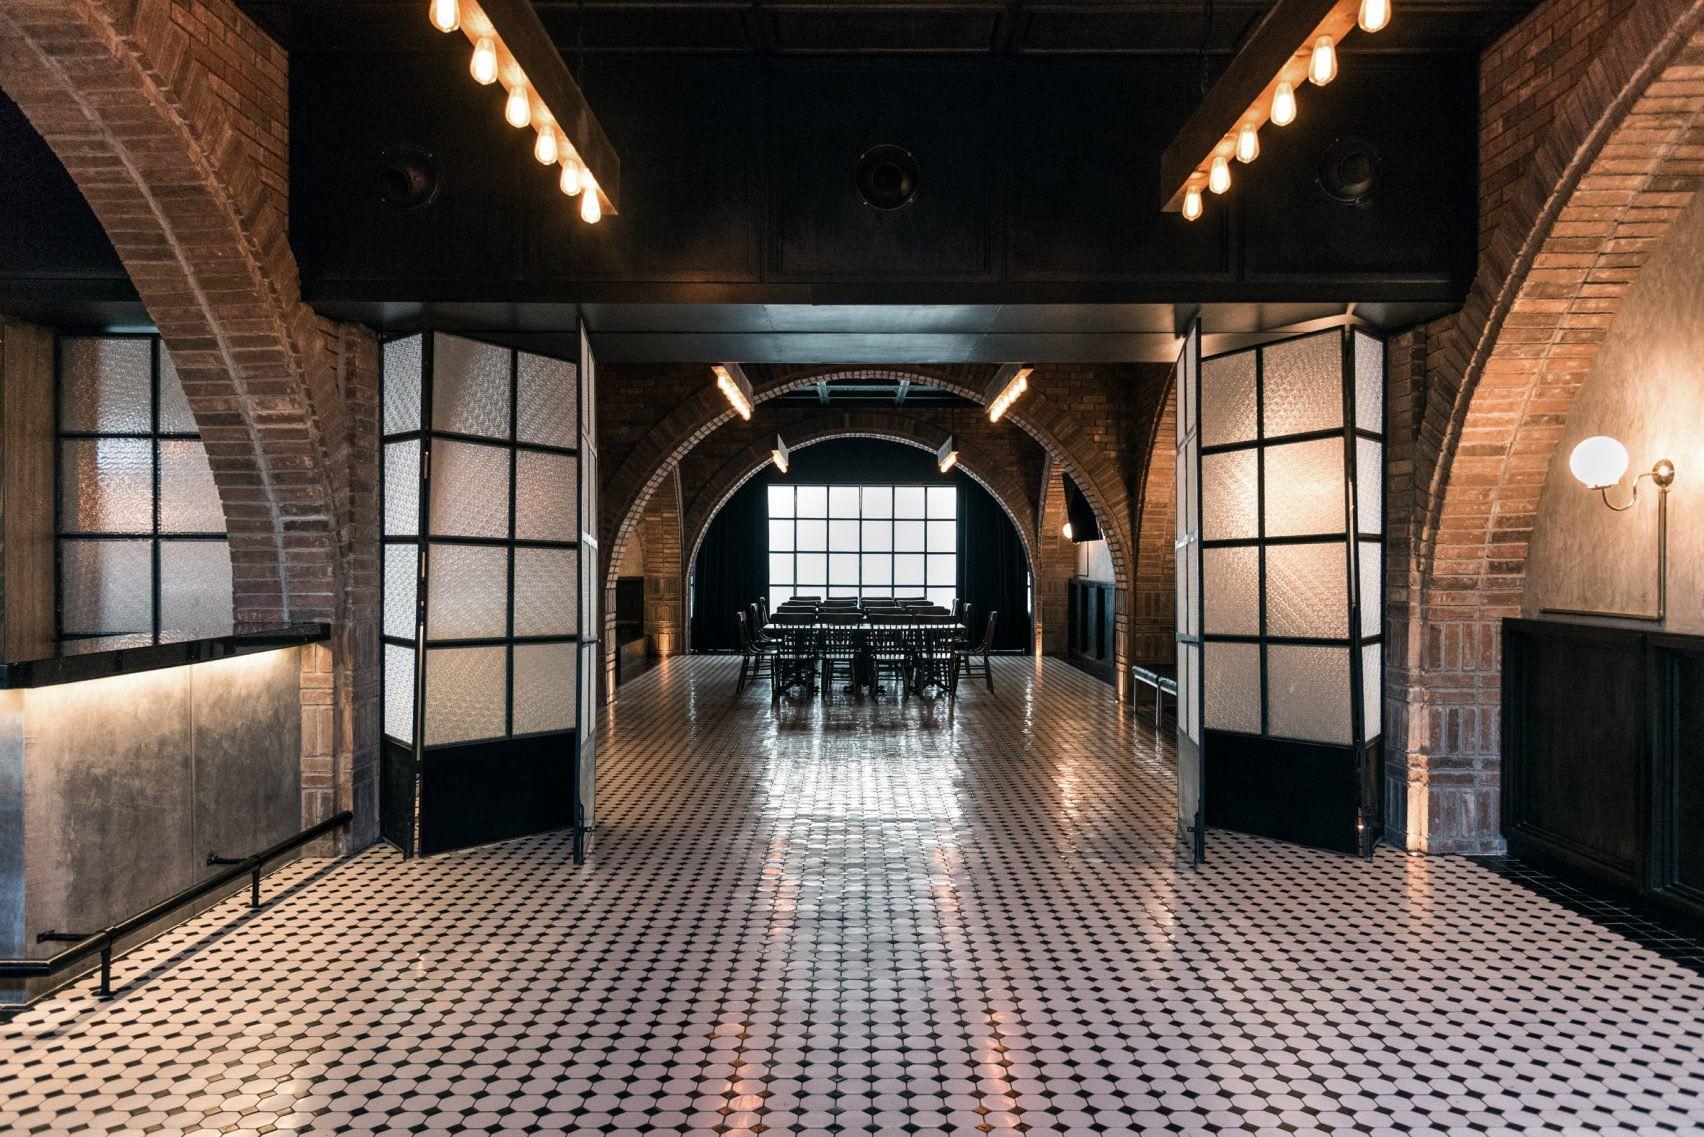 Salon Sociedad Communal Interiors Restaurants and bars   www.designlimitededition.com  #interiordesign #highendrestaurants #inspirationsandideas #bestrestaurants #restaurantswithaview #restaurantdesign #japaneserestaurant